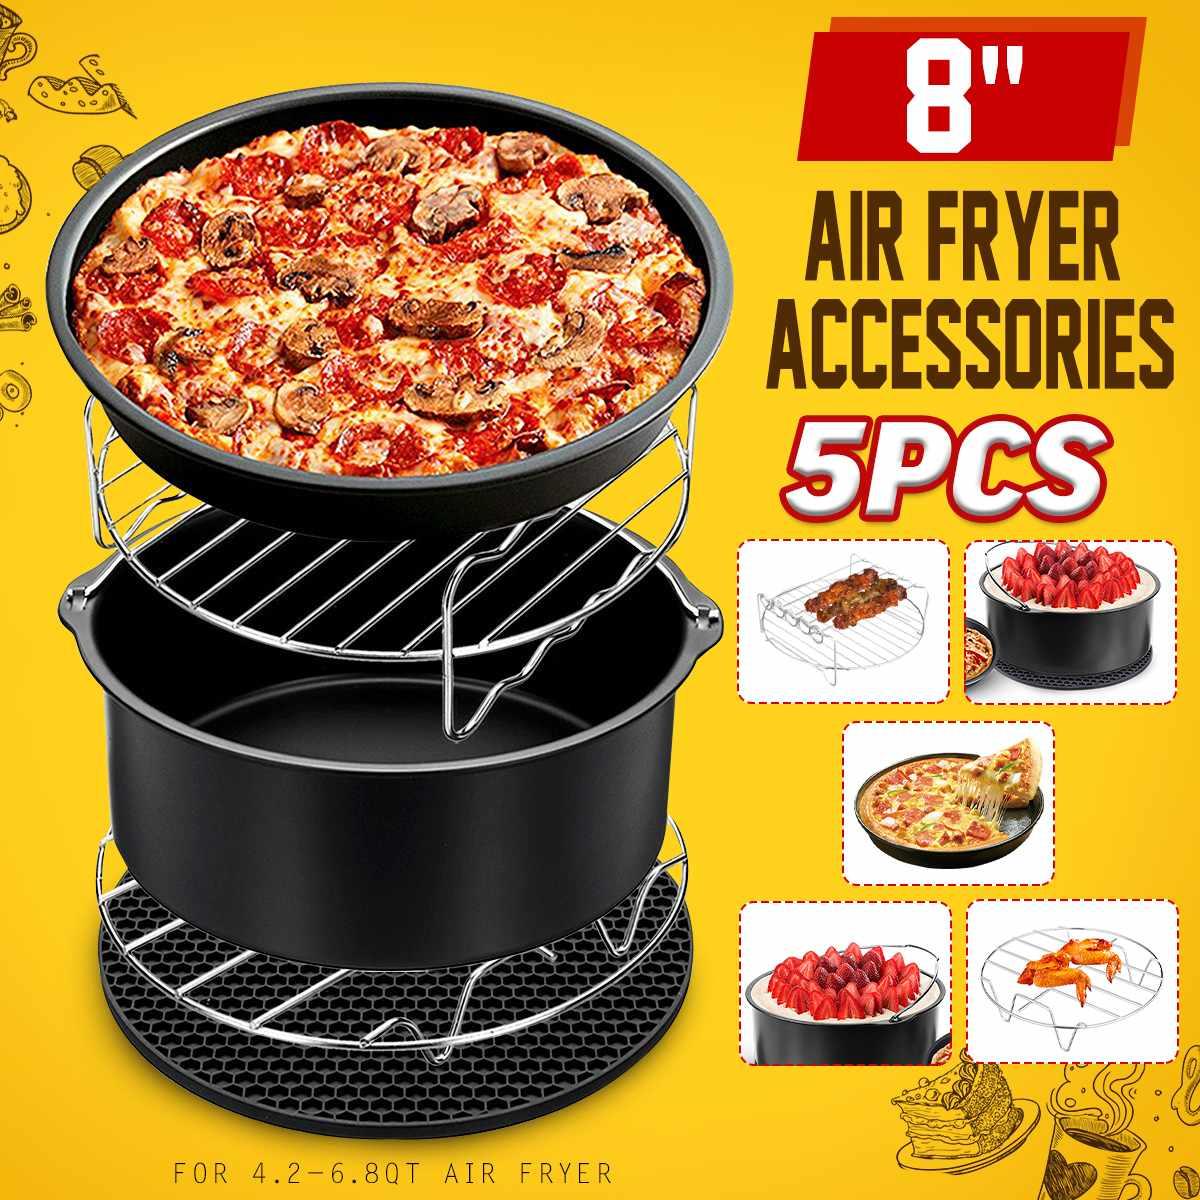 9Pcs 9IN1 8 Inch Air Fryer Accessories Set Chips Baking Air Fryer Accessories Set Chips Baking Basket Pan Rack For 4.2QT-6.8QT